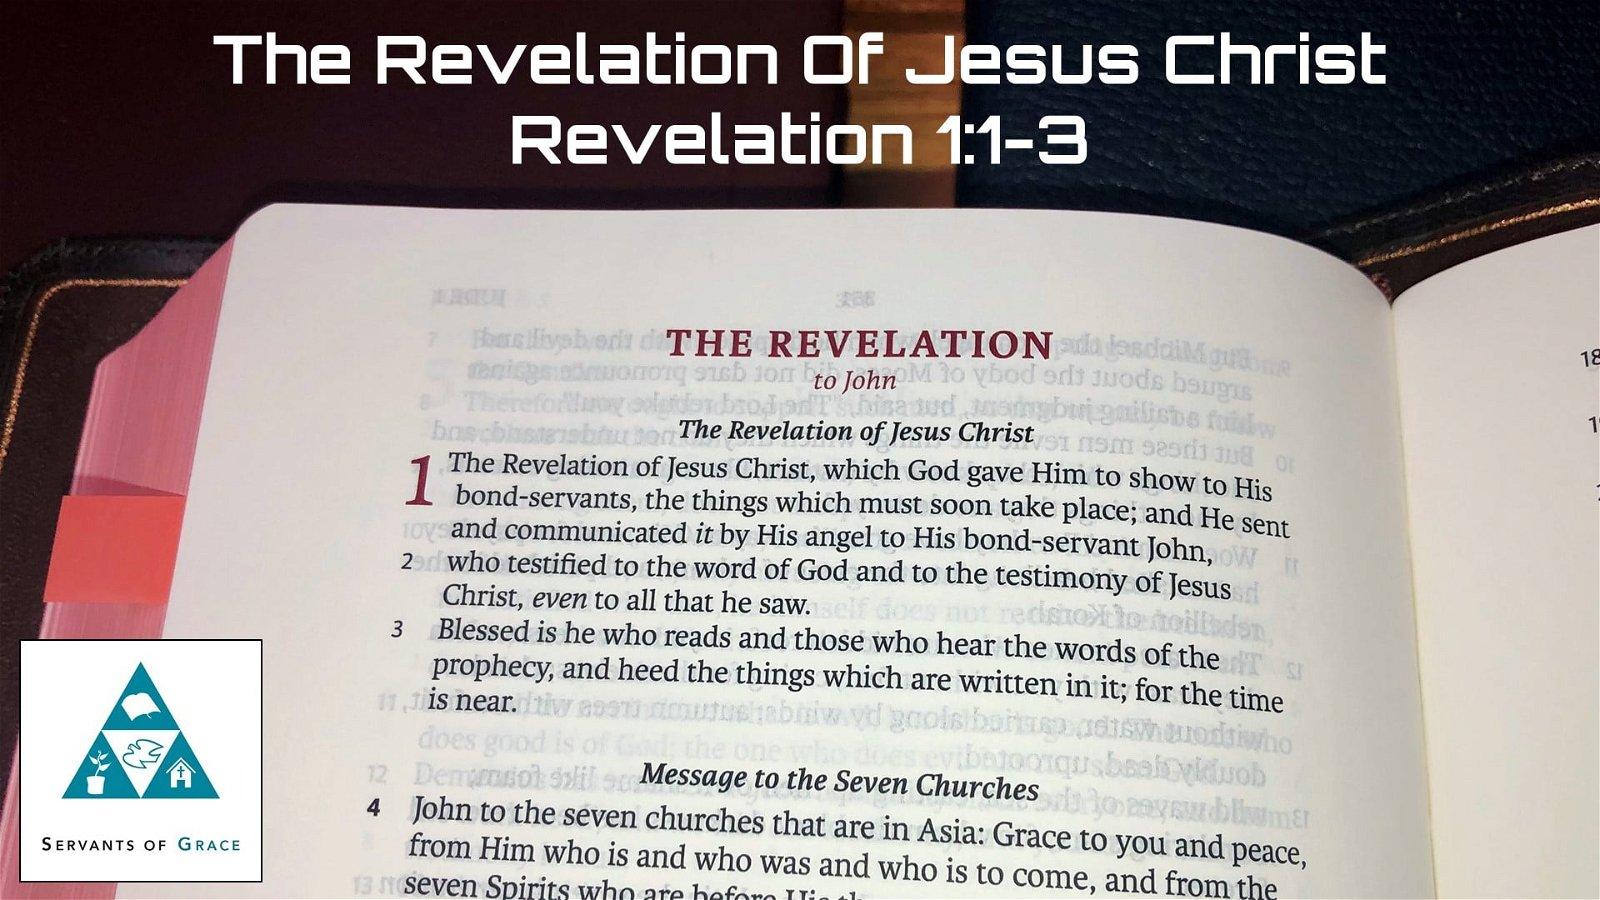 #1: The Revelation of Jesus Christ[Sermon] 1